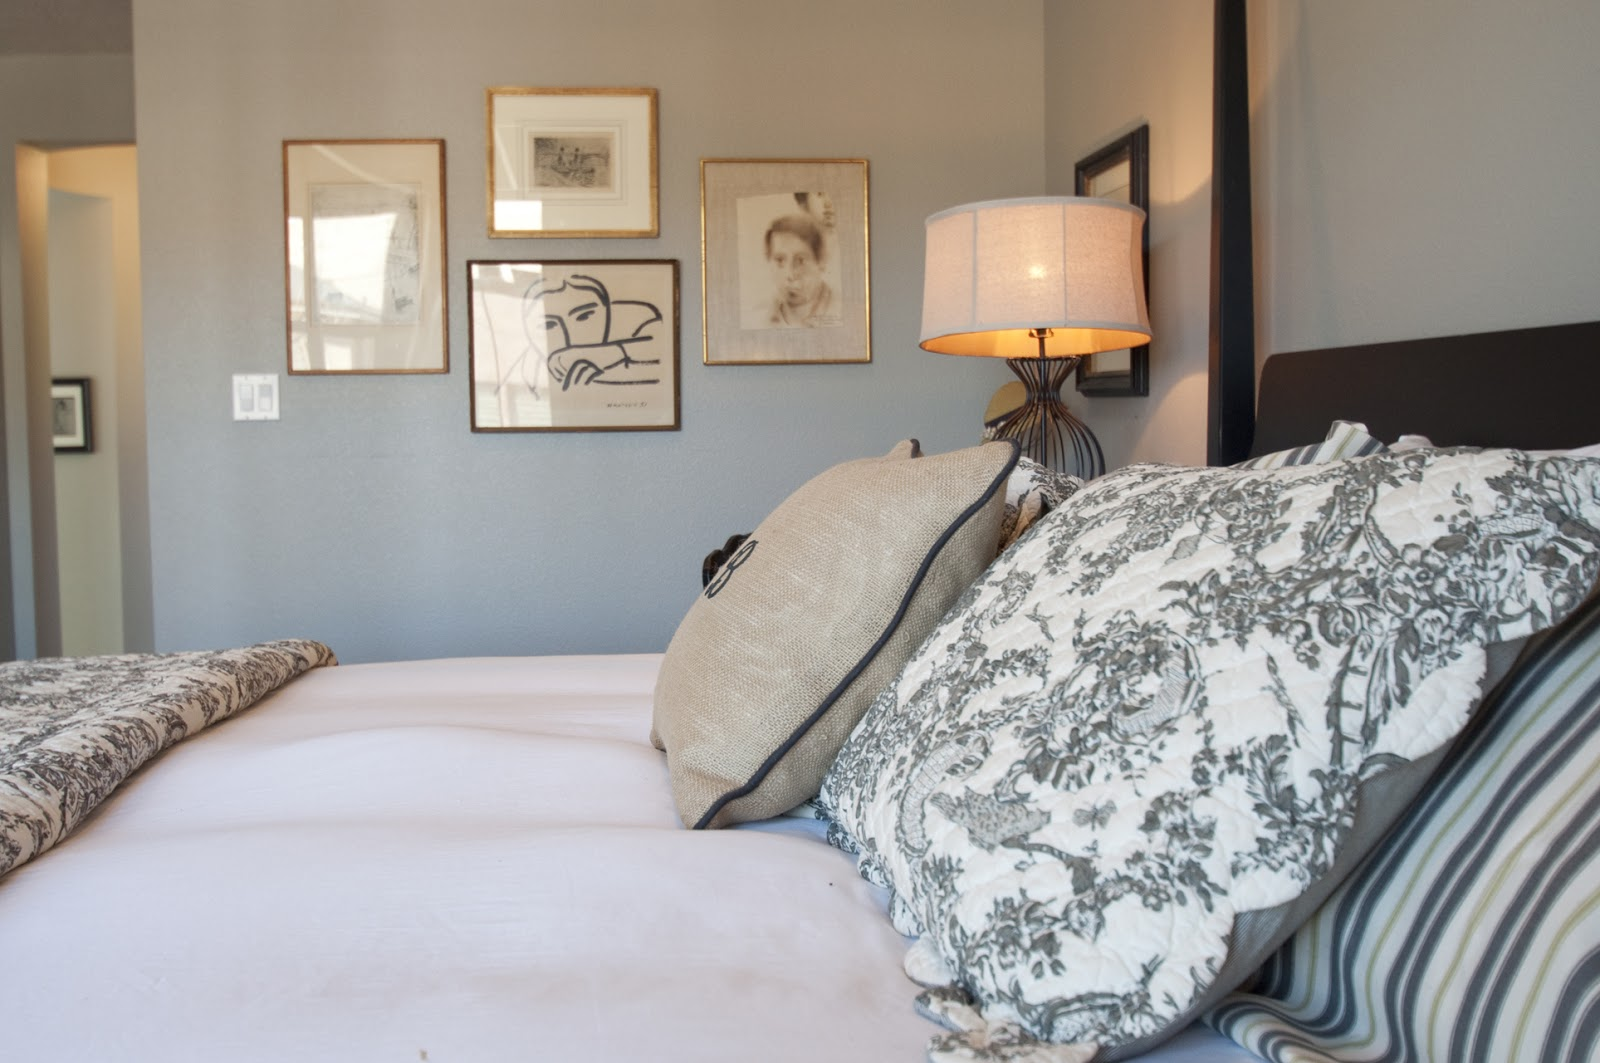 allison corona photography interior designer s home in boise id